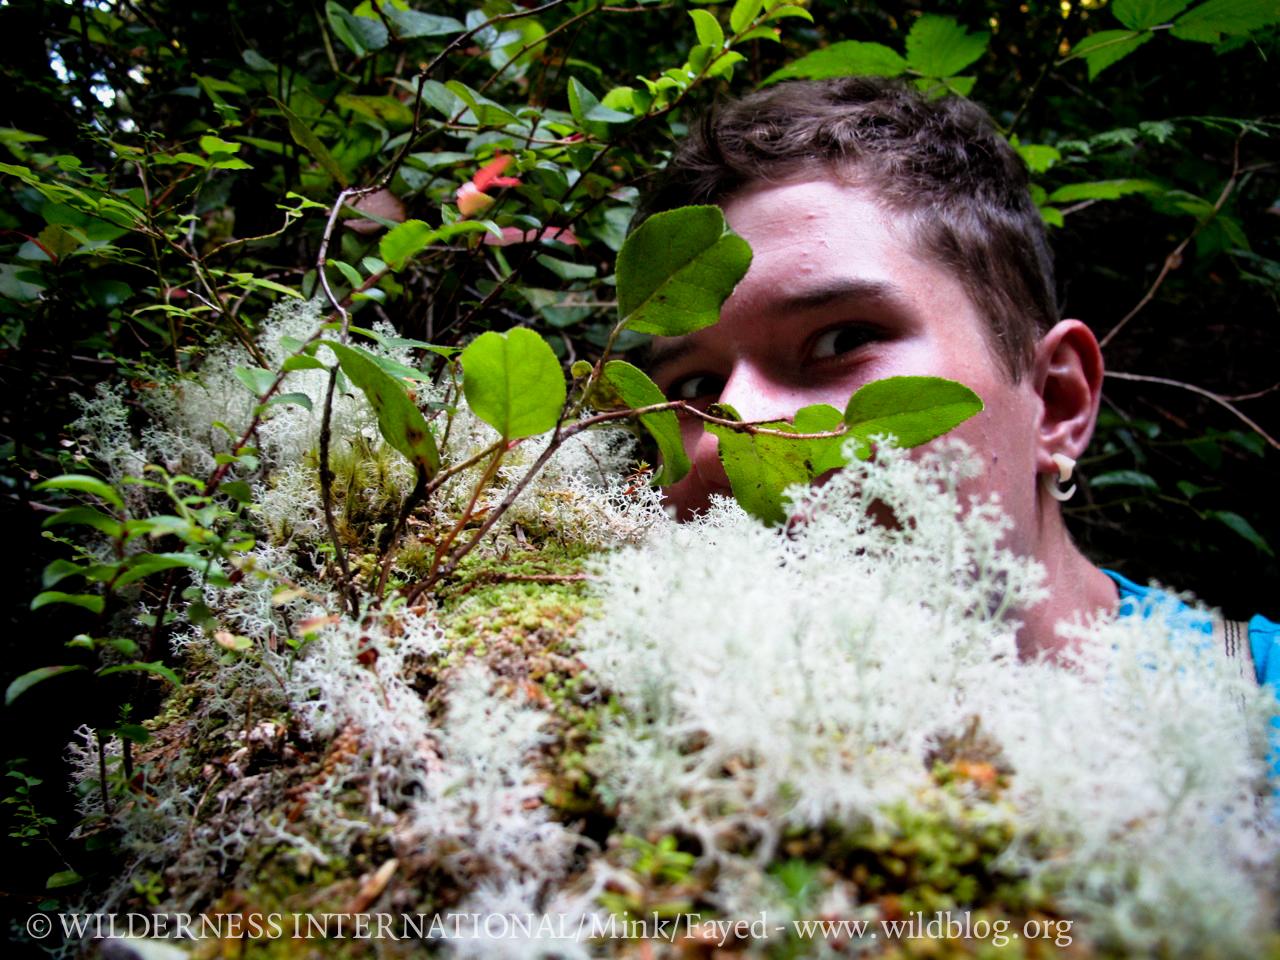 http://wi.wildblog.org/wp-content/uploads/2012/07/lr-1148.jpg